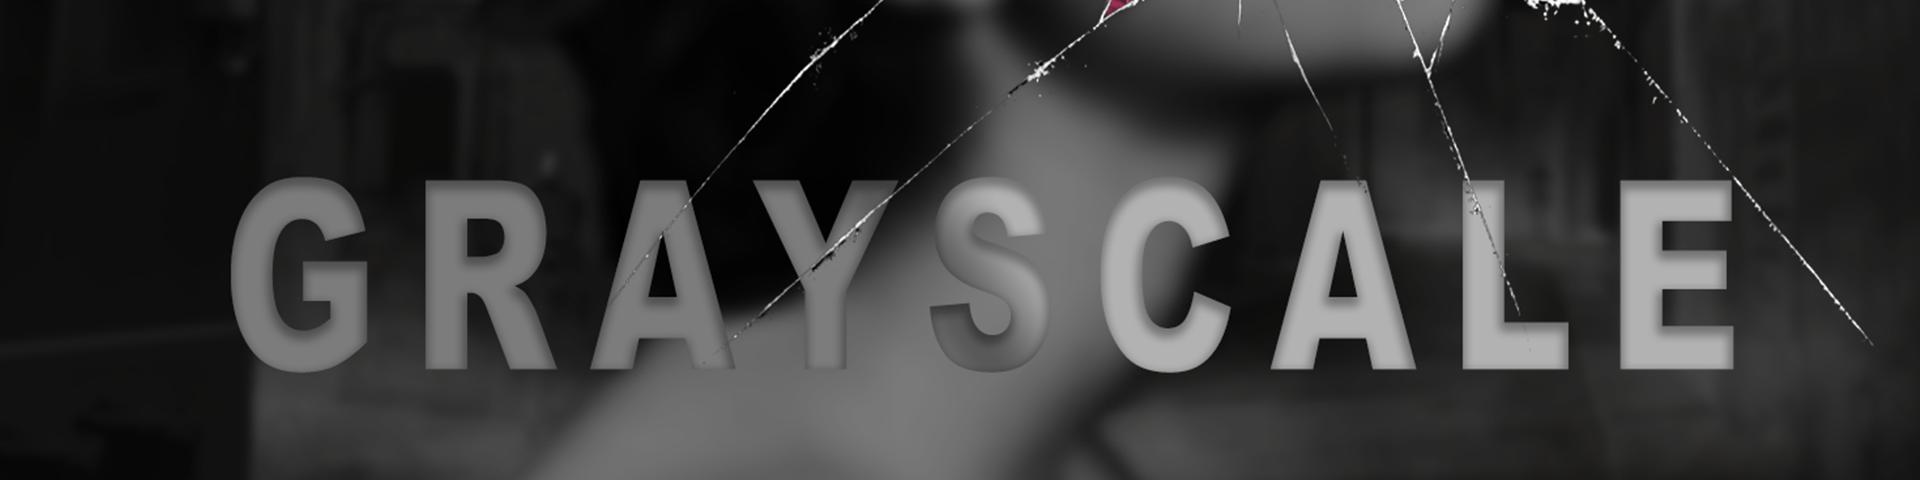 Grayscale Demo